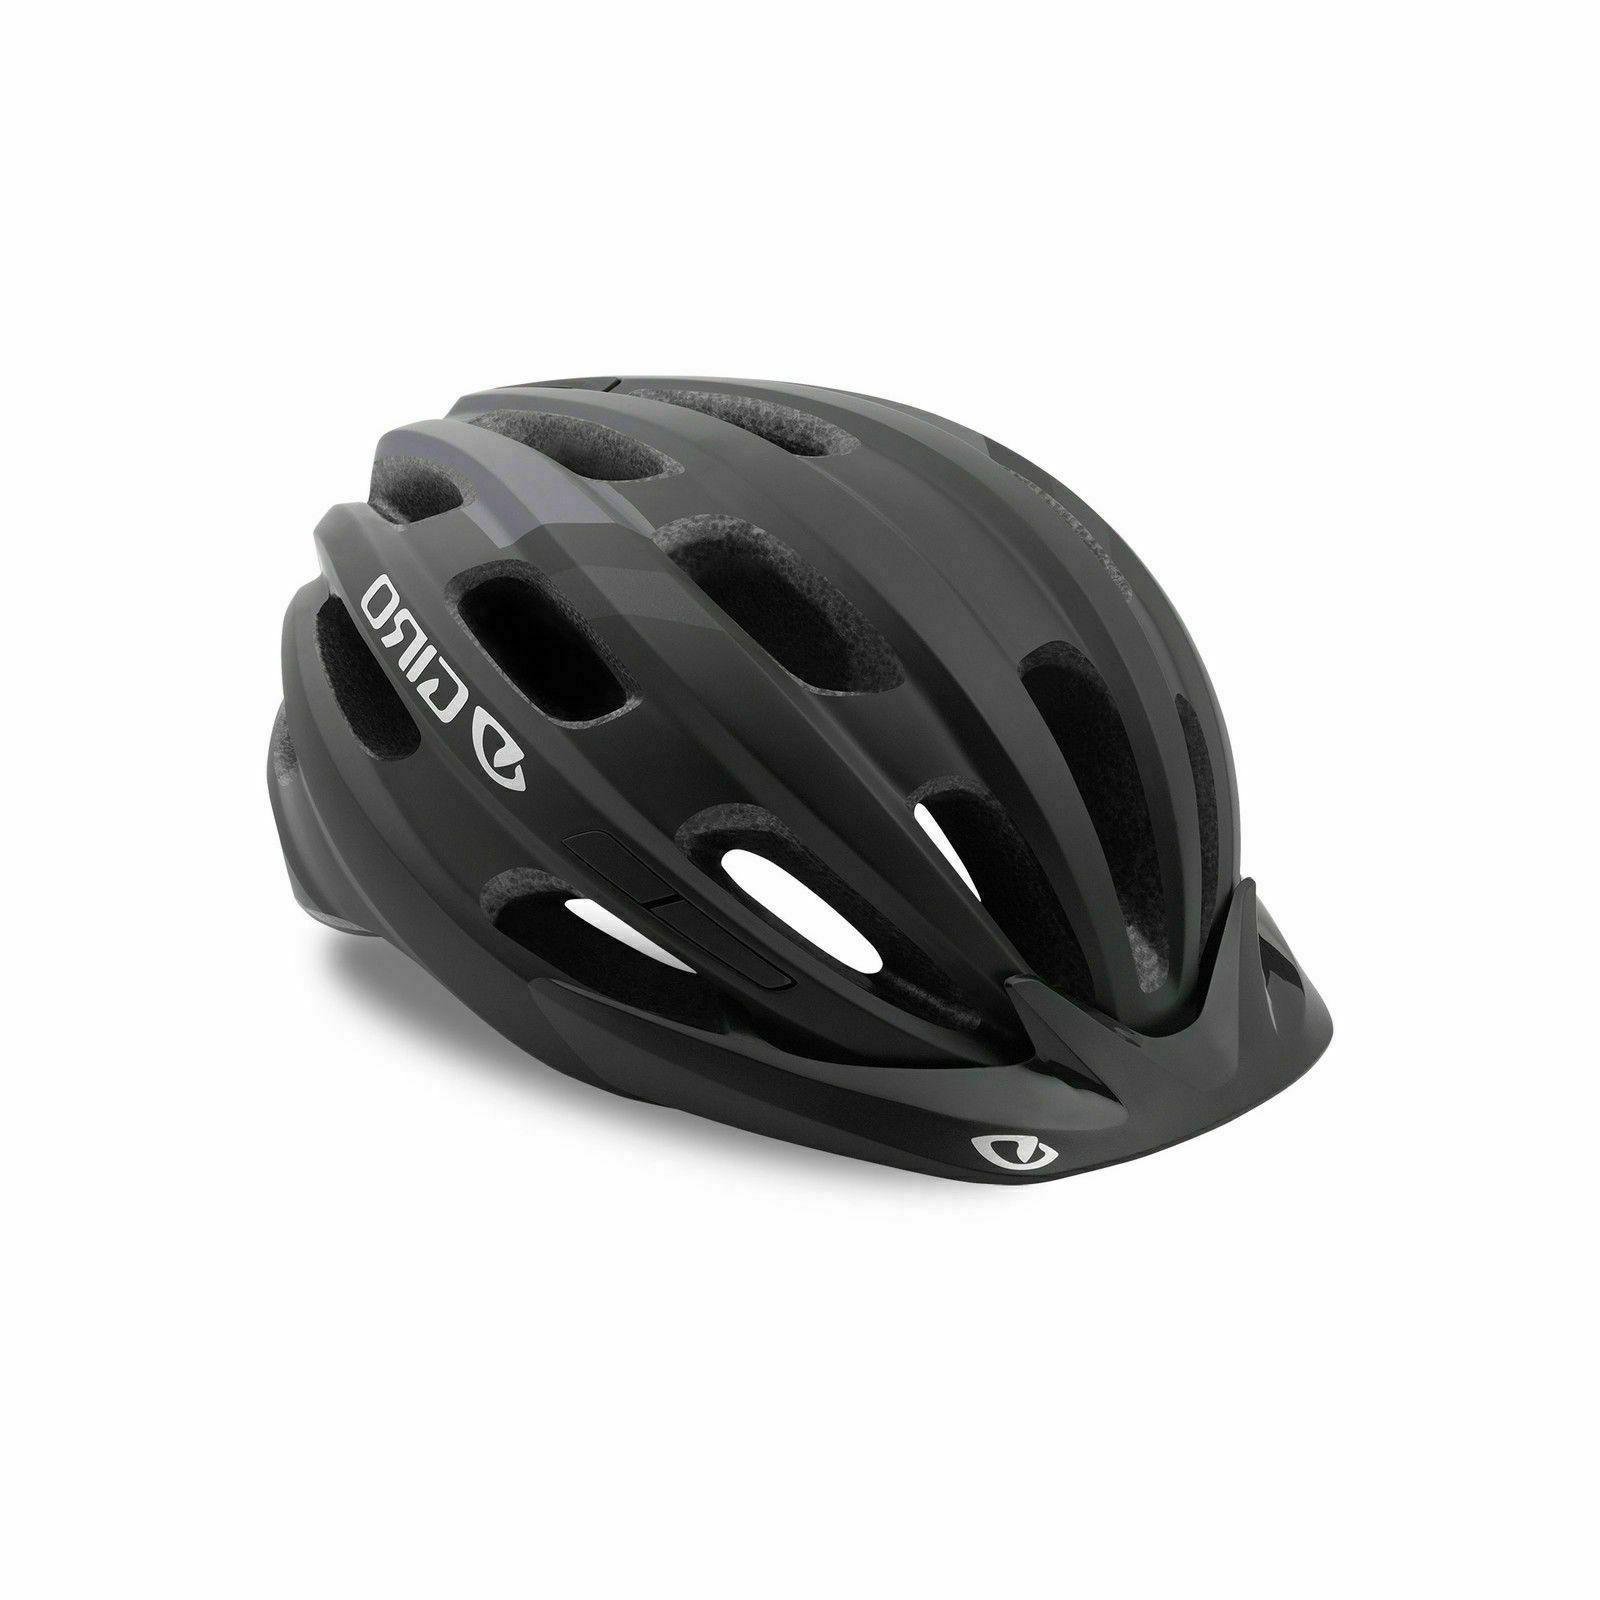 Giro Hale MIPS Kids Mountain Bike Helmet, Universal Youth